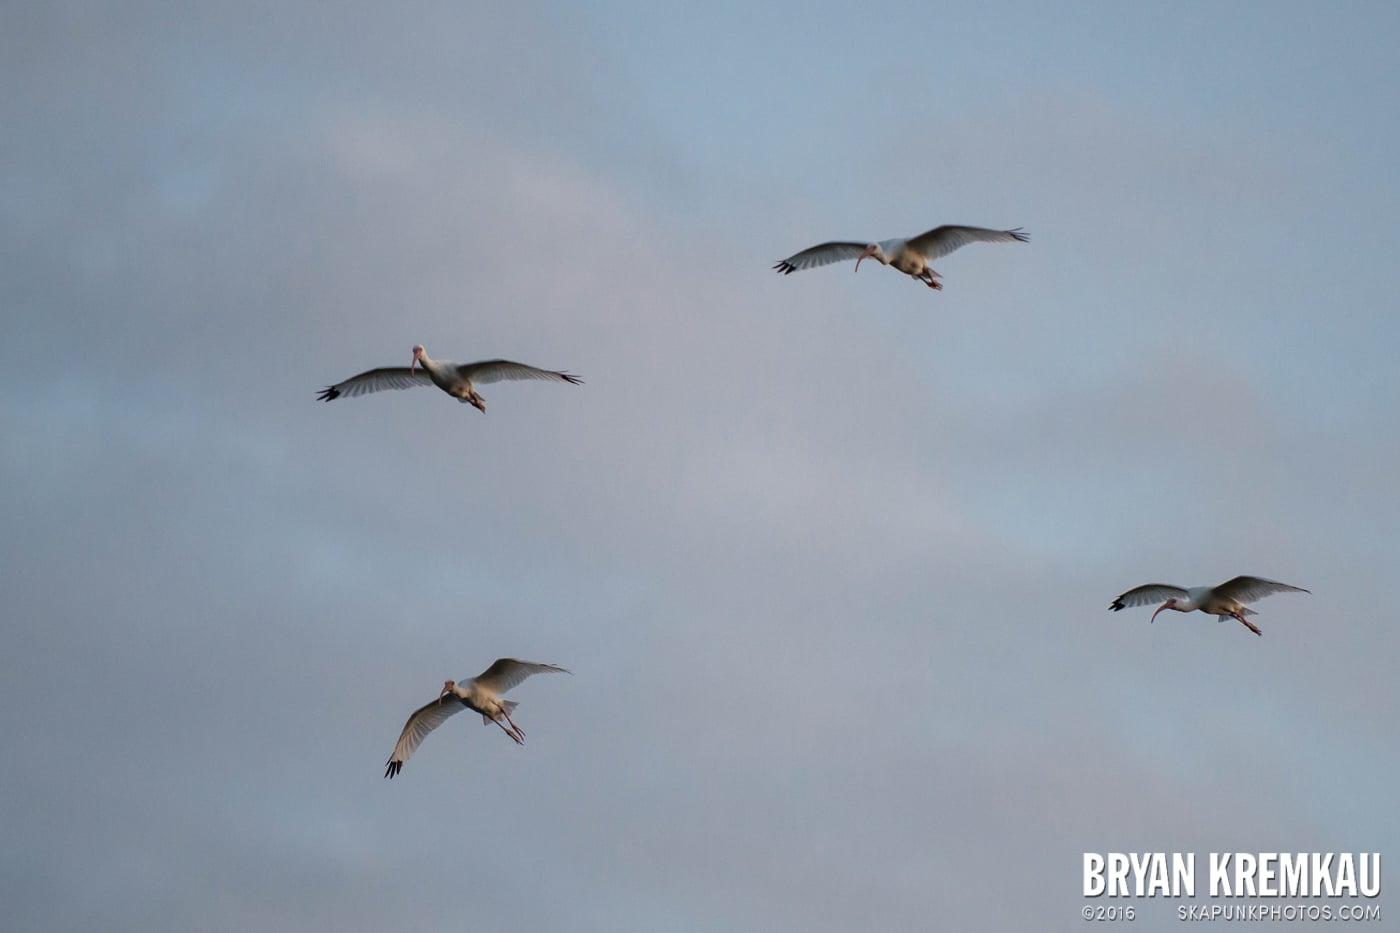 Sunsets, Astrophotography & Birds @ Venice, Florida - 10.25.14 - 11.5.14 (13)